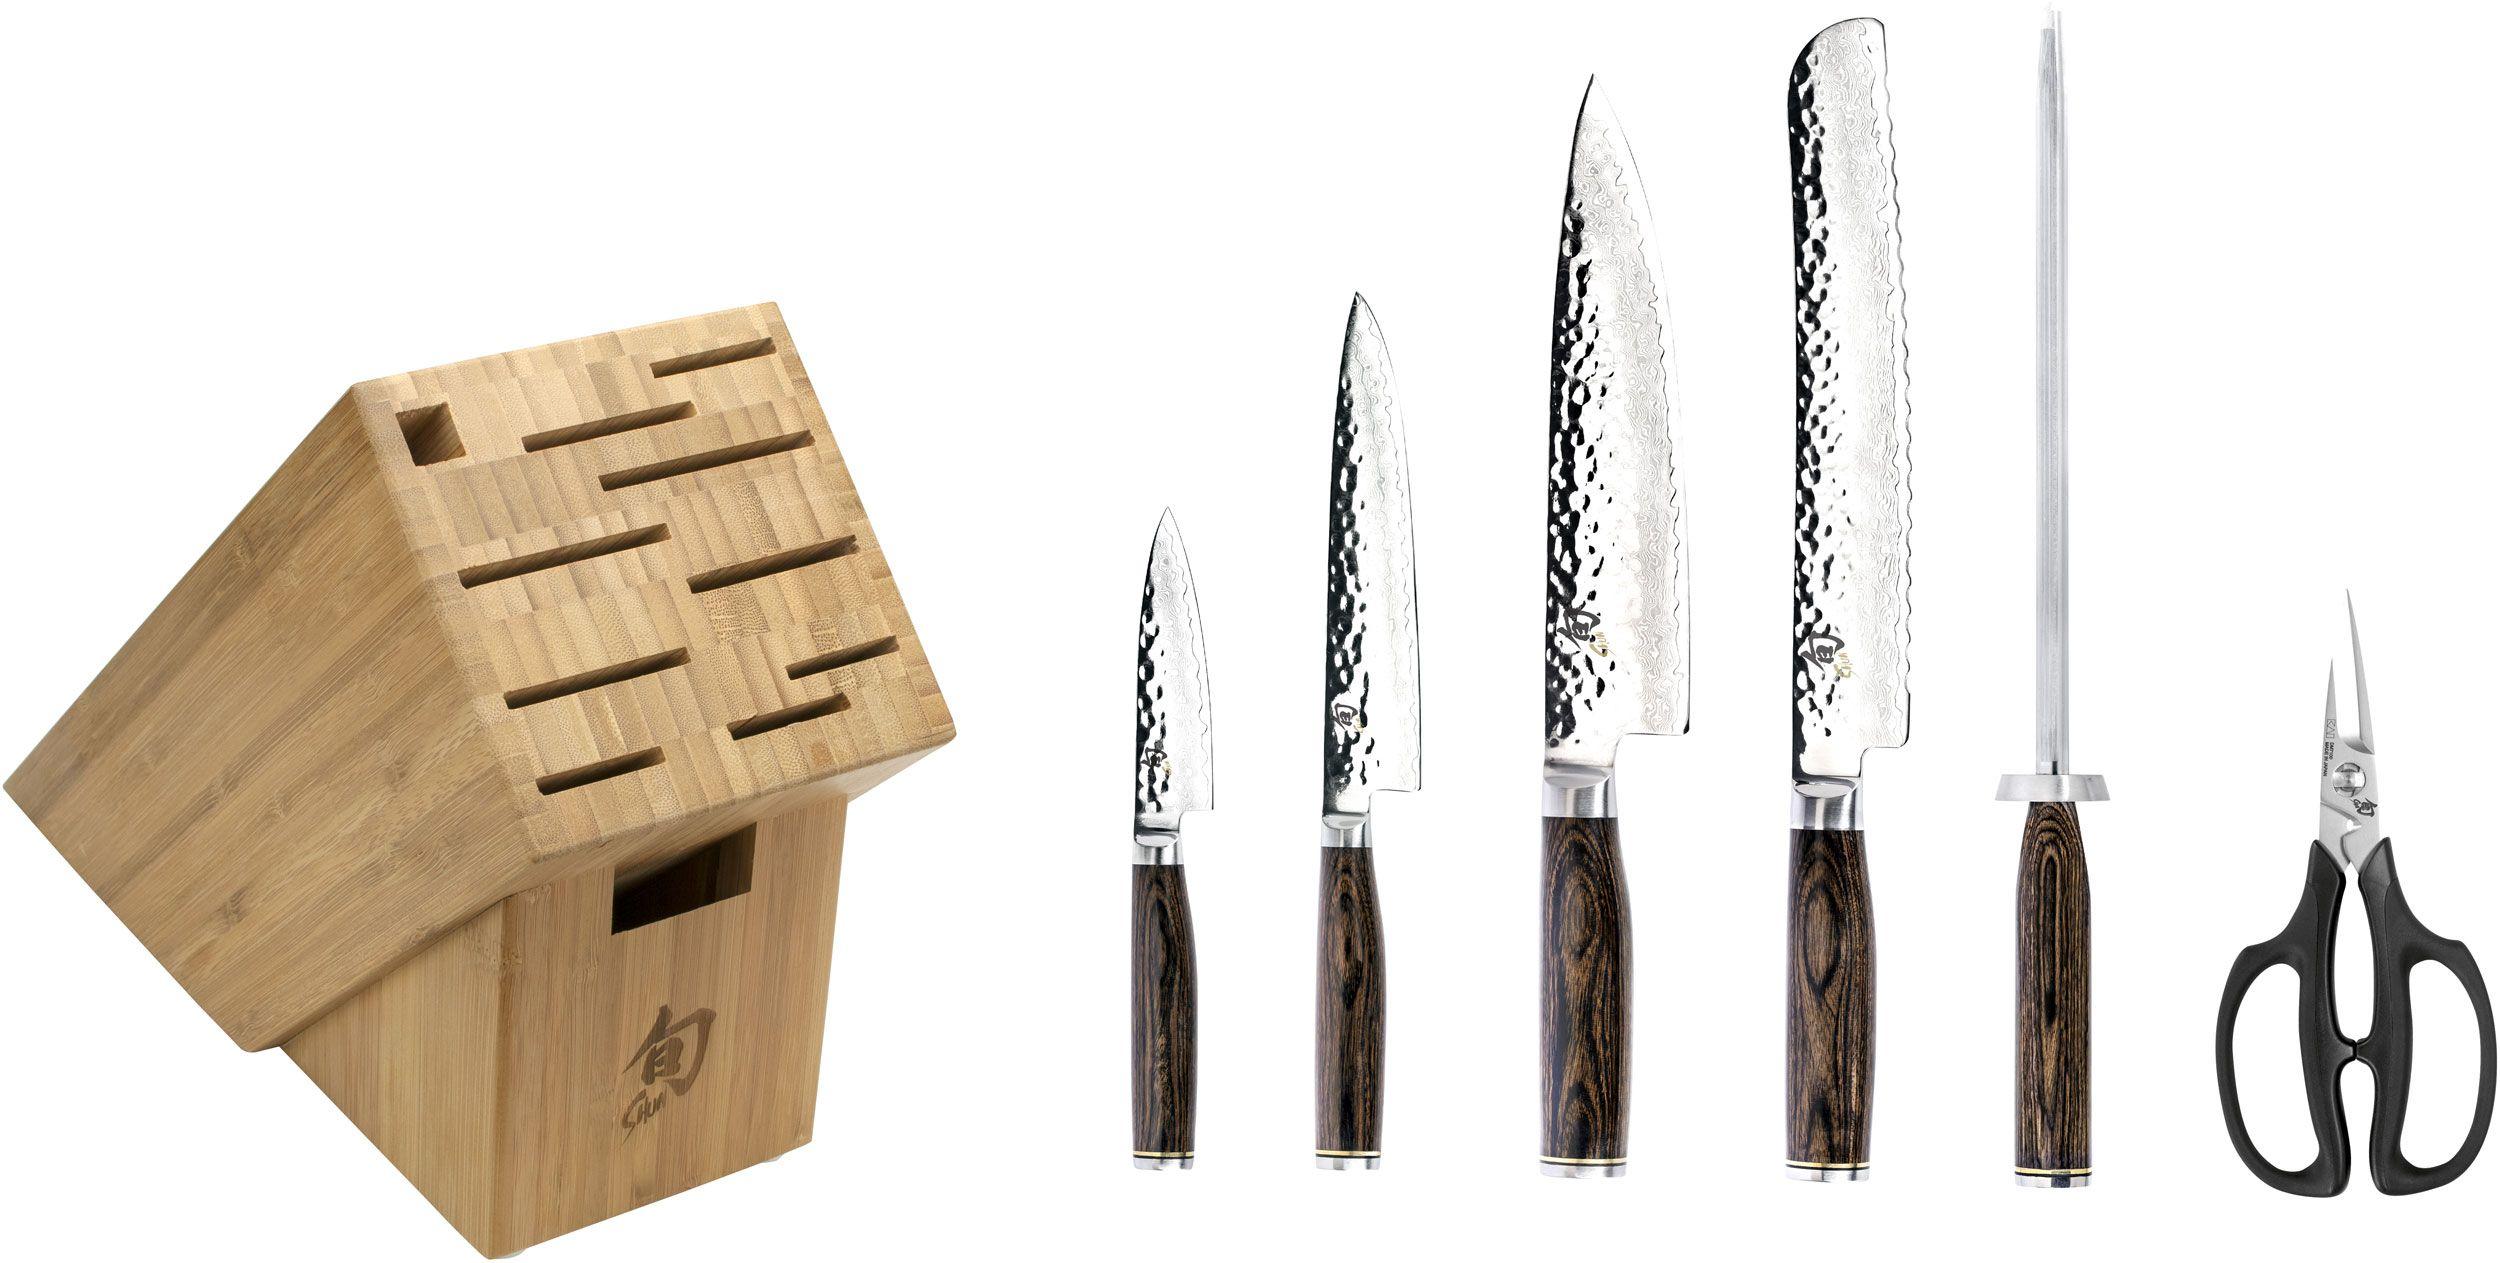 Shun TDMS0700 Premier 7 Piece Essential Bamboo Block Set